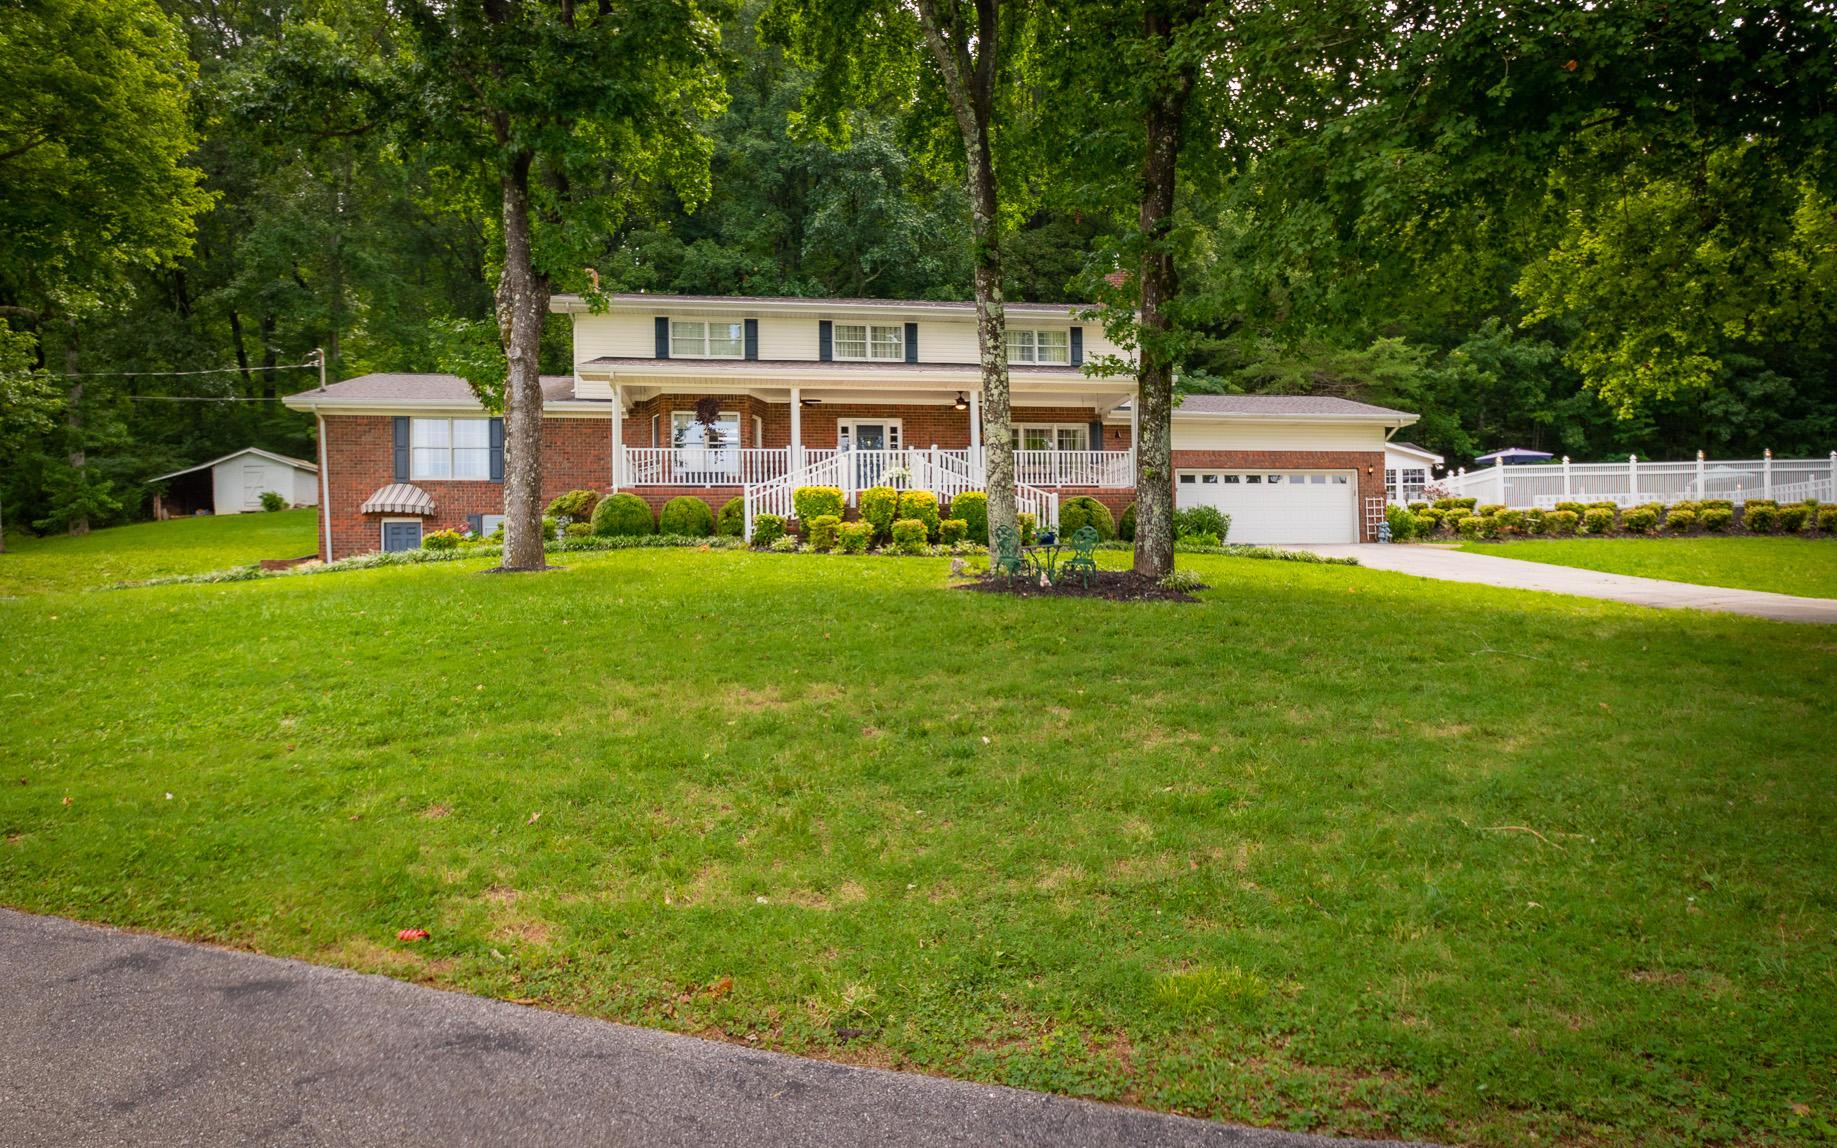 6035 Shirley Pond Rd, Harrison, TN 37341